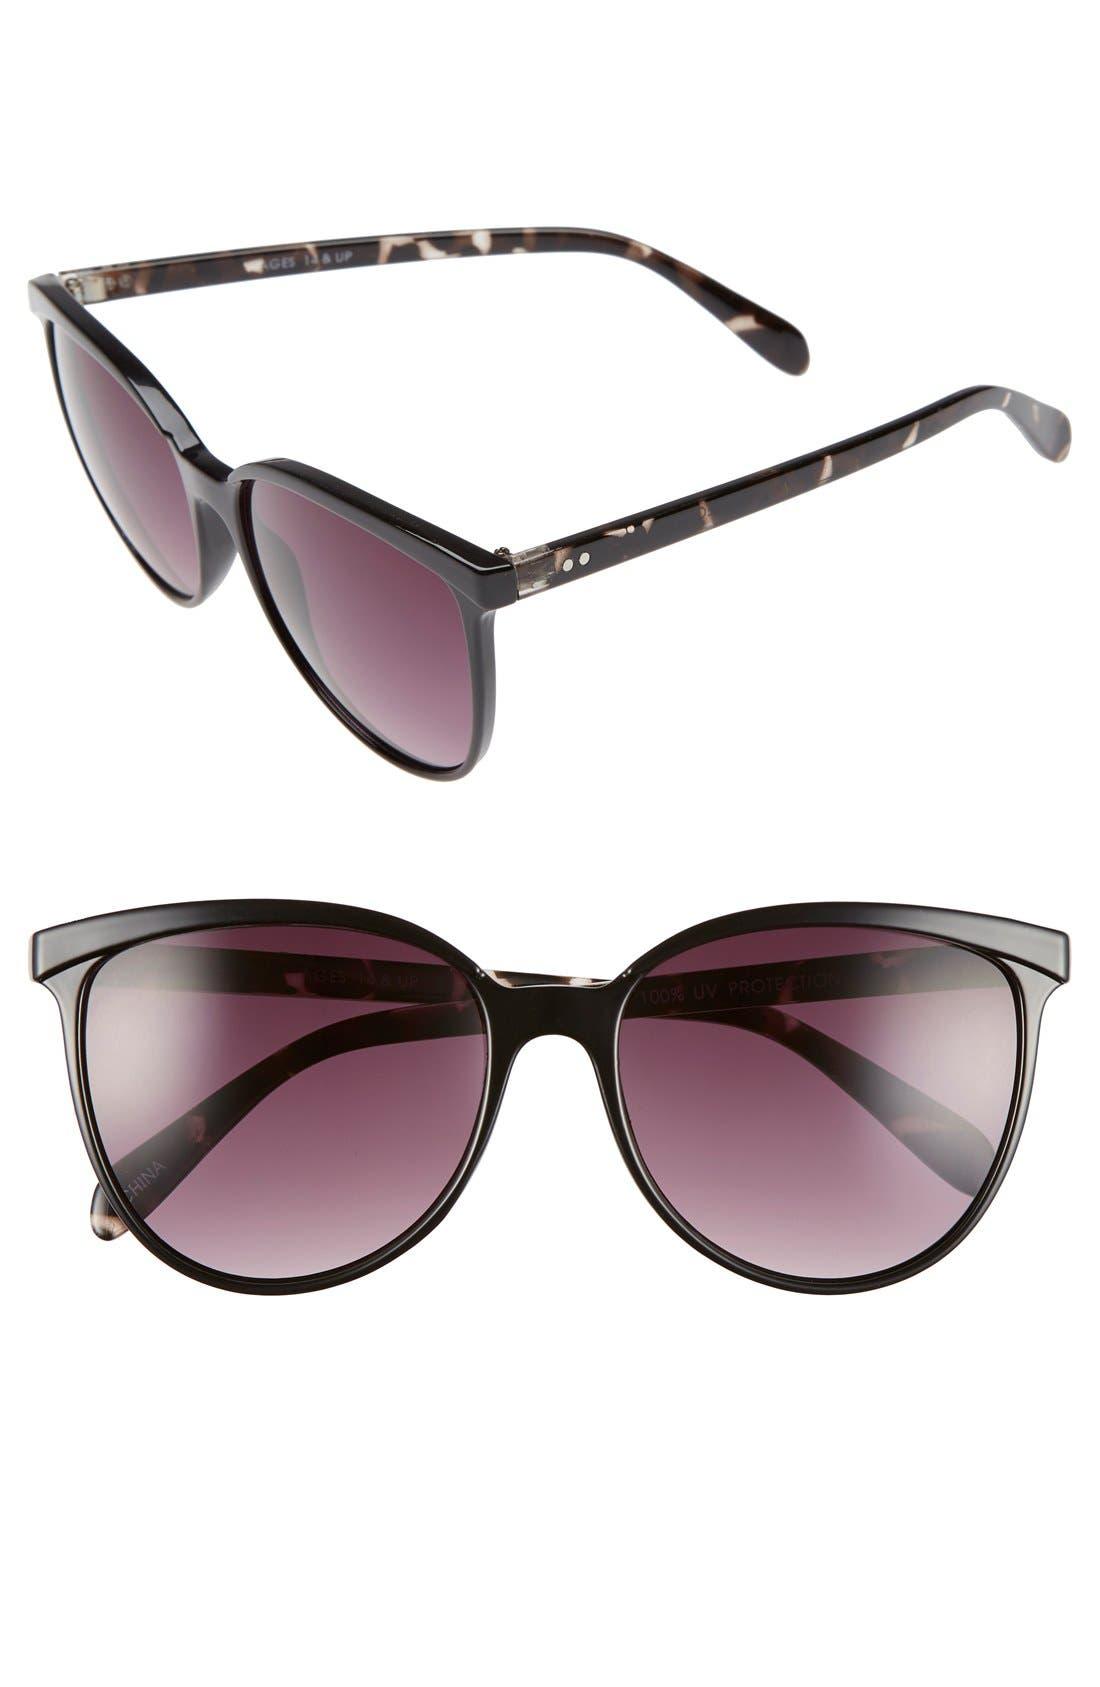 Alternate Image 1 Selected - BP. 56mm Two-Tone Cat Eye Sunglasses